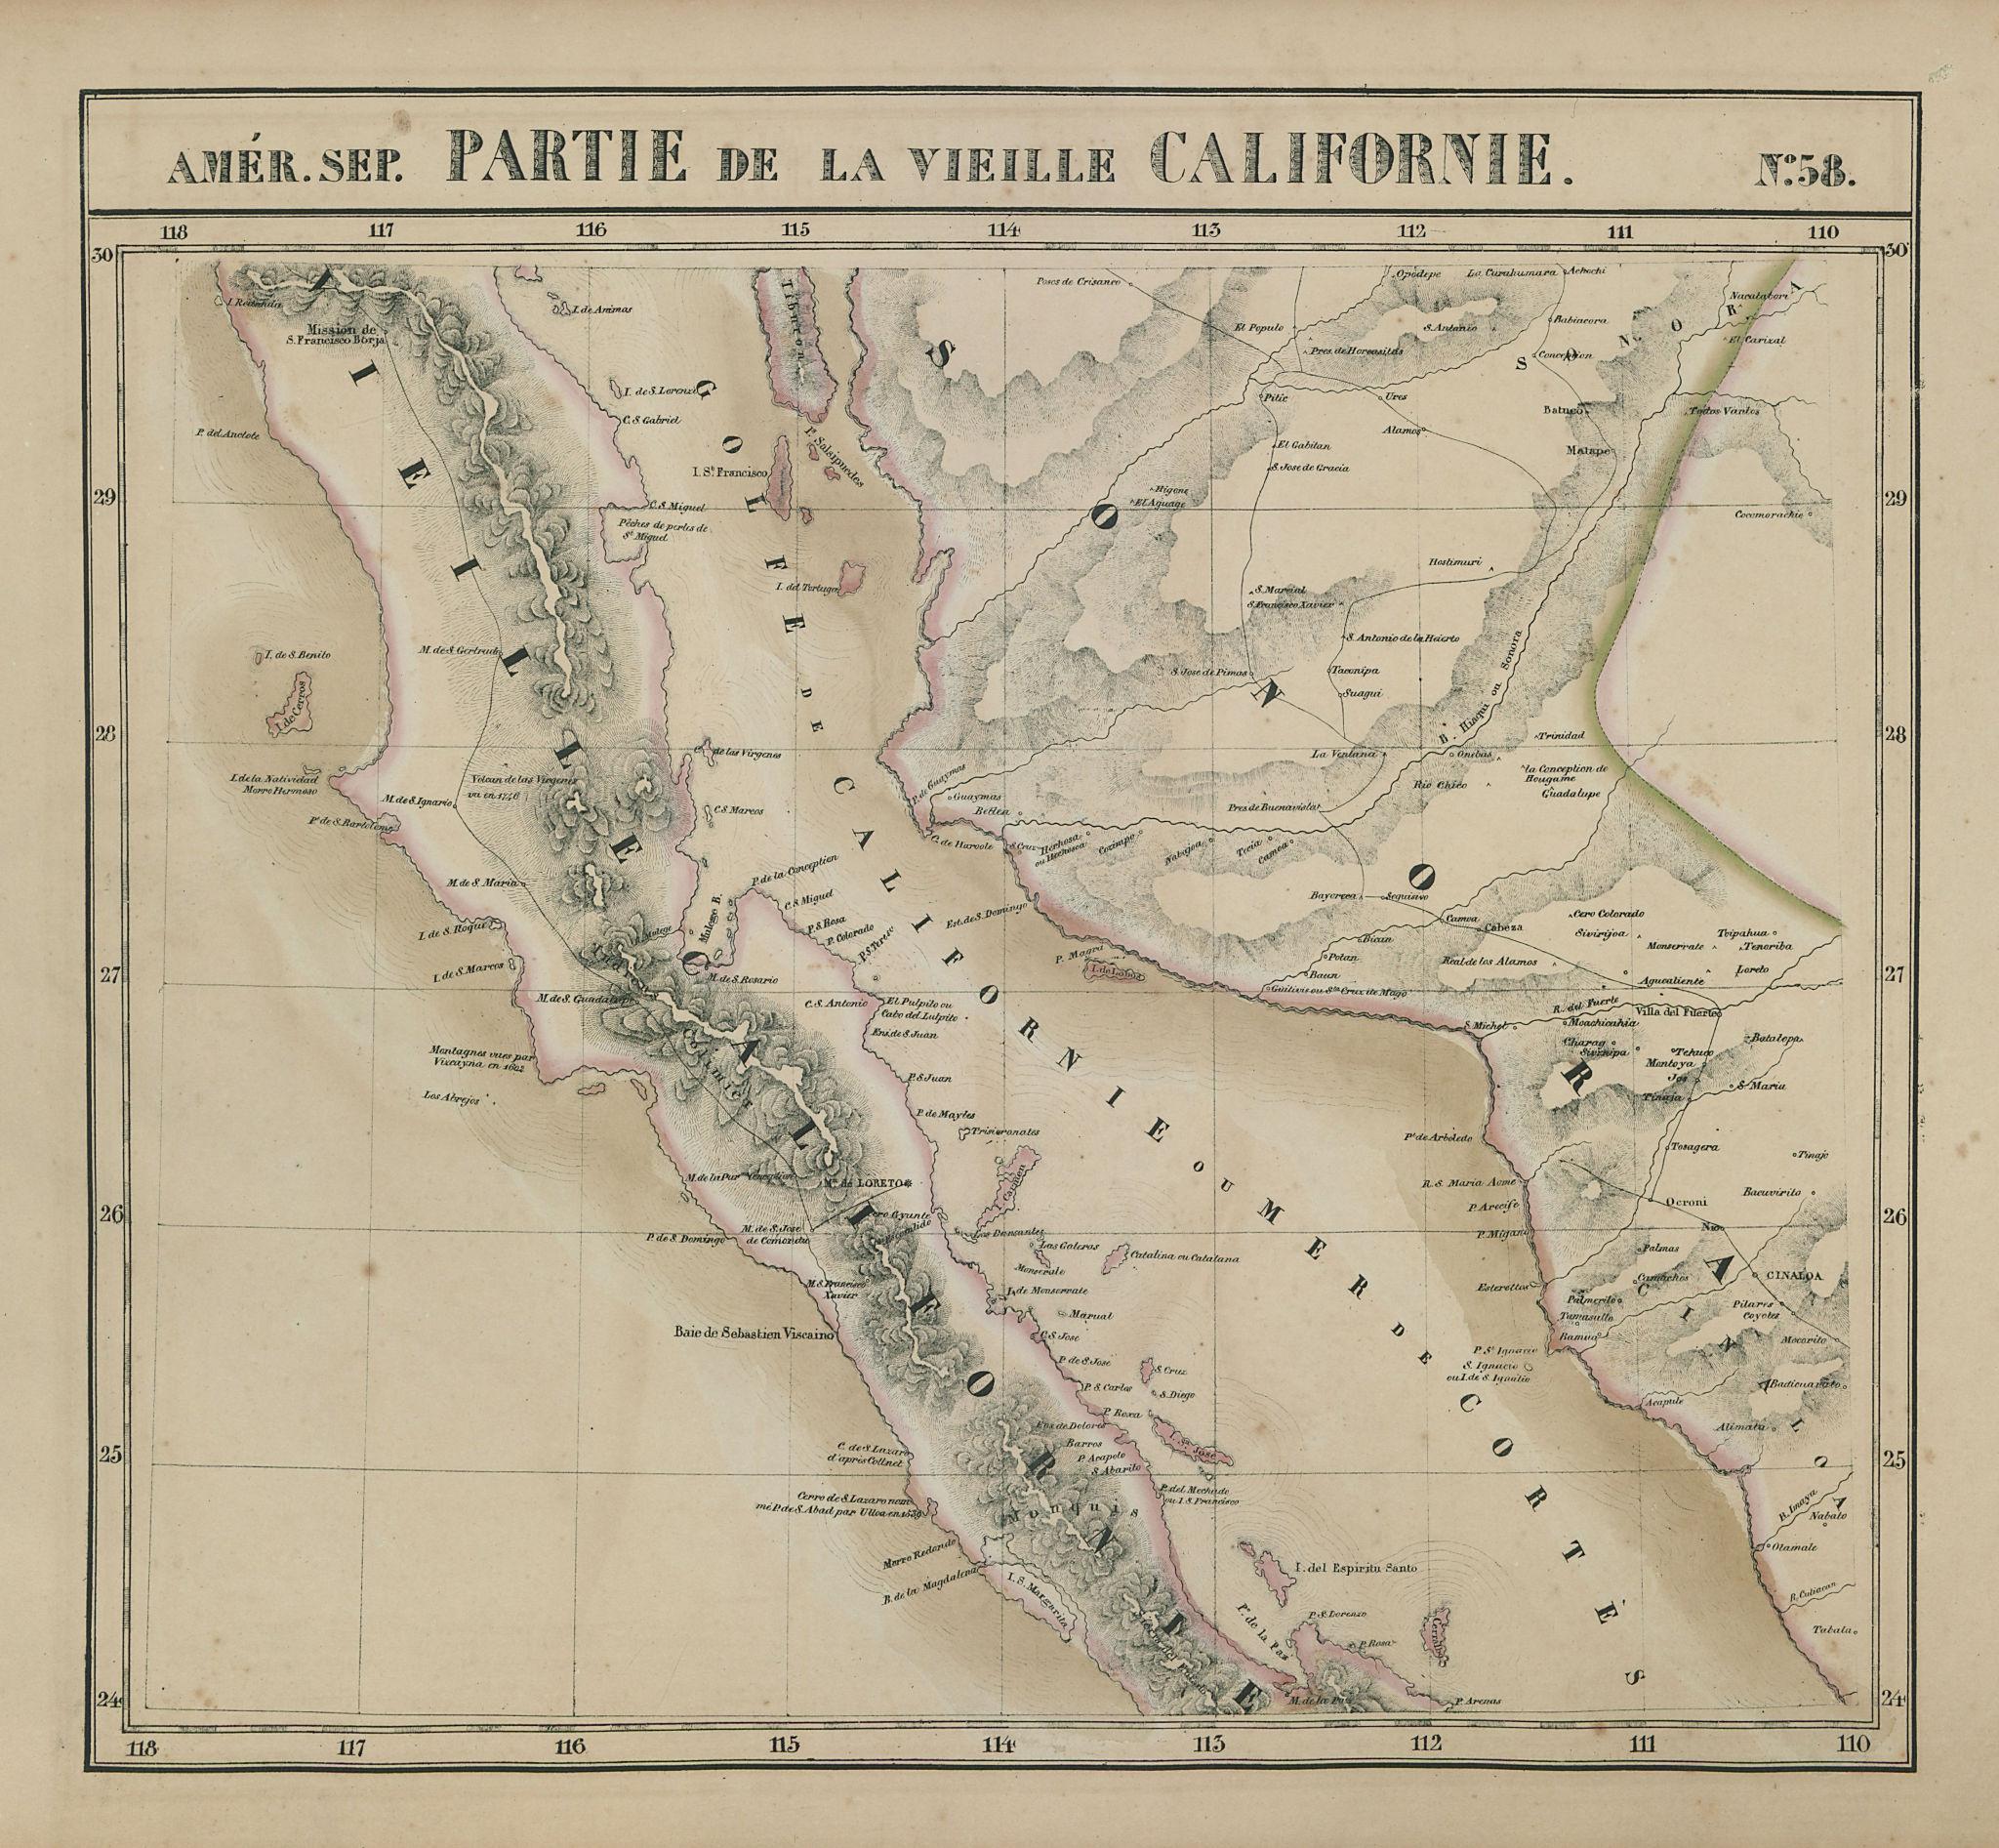 Amér Sep Partie de la Vielle Californie 58 Baja California VANDERMAELEN 1827 map